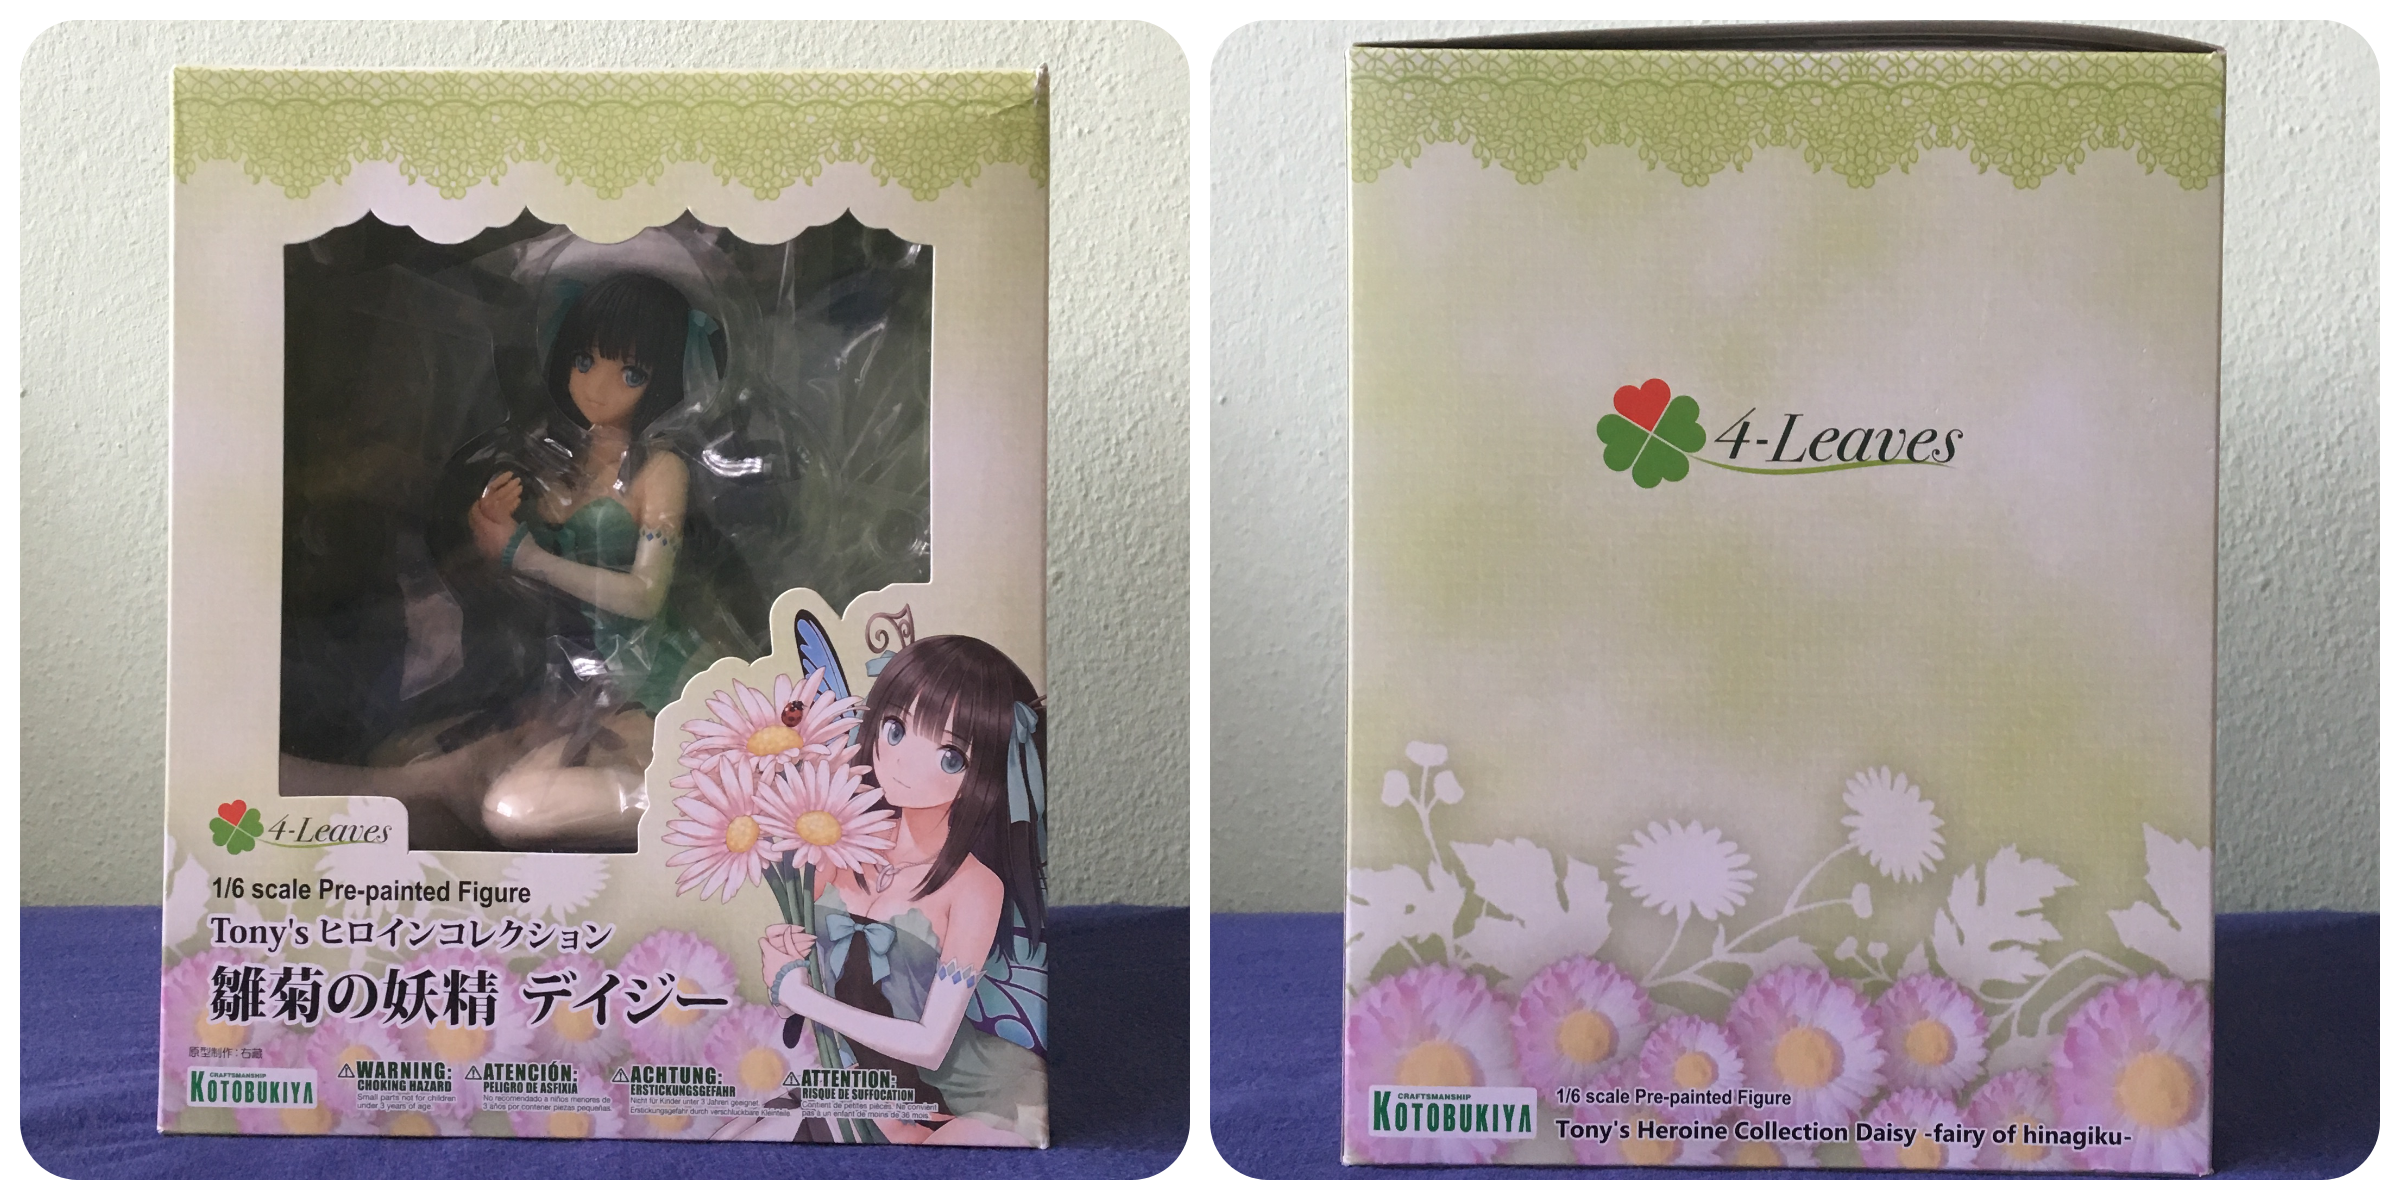 Kotobukiya 4-Leaves Tonys Heroine Collection Hinagiku no Yousei Daisy 1//6 Figure